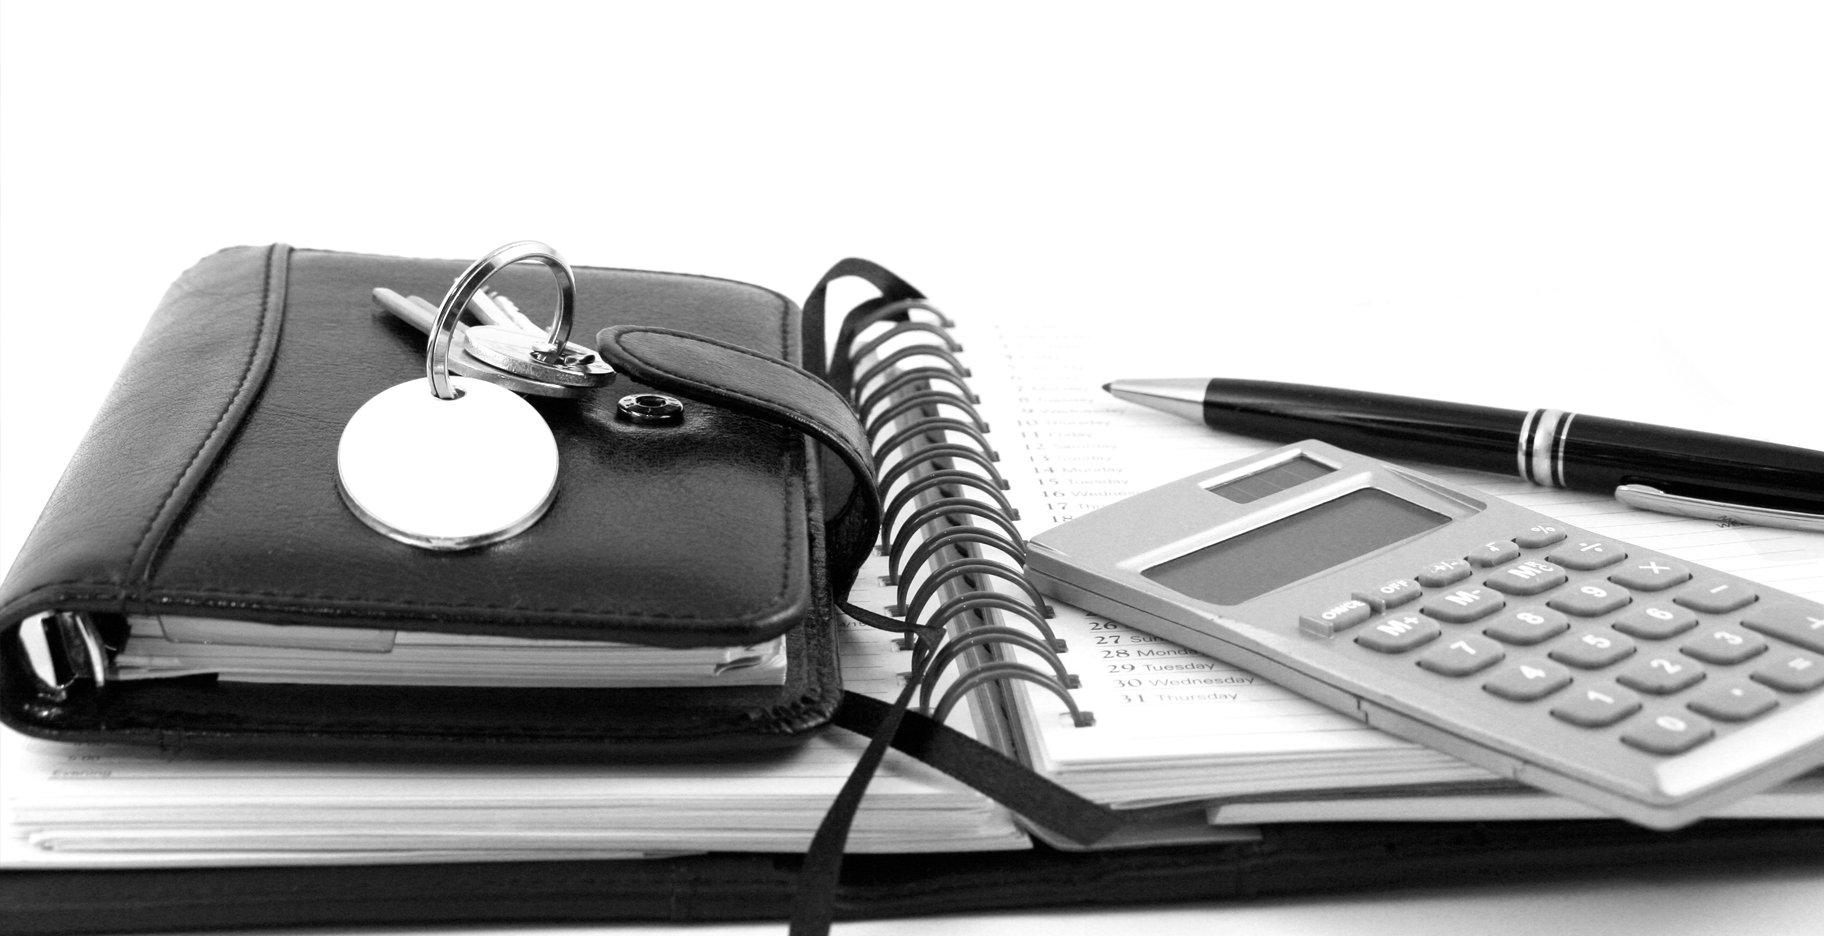 agenda, wallet, keys, pen and calculator branch law firm